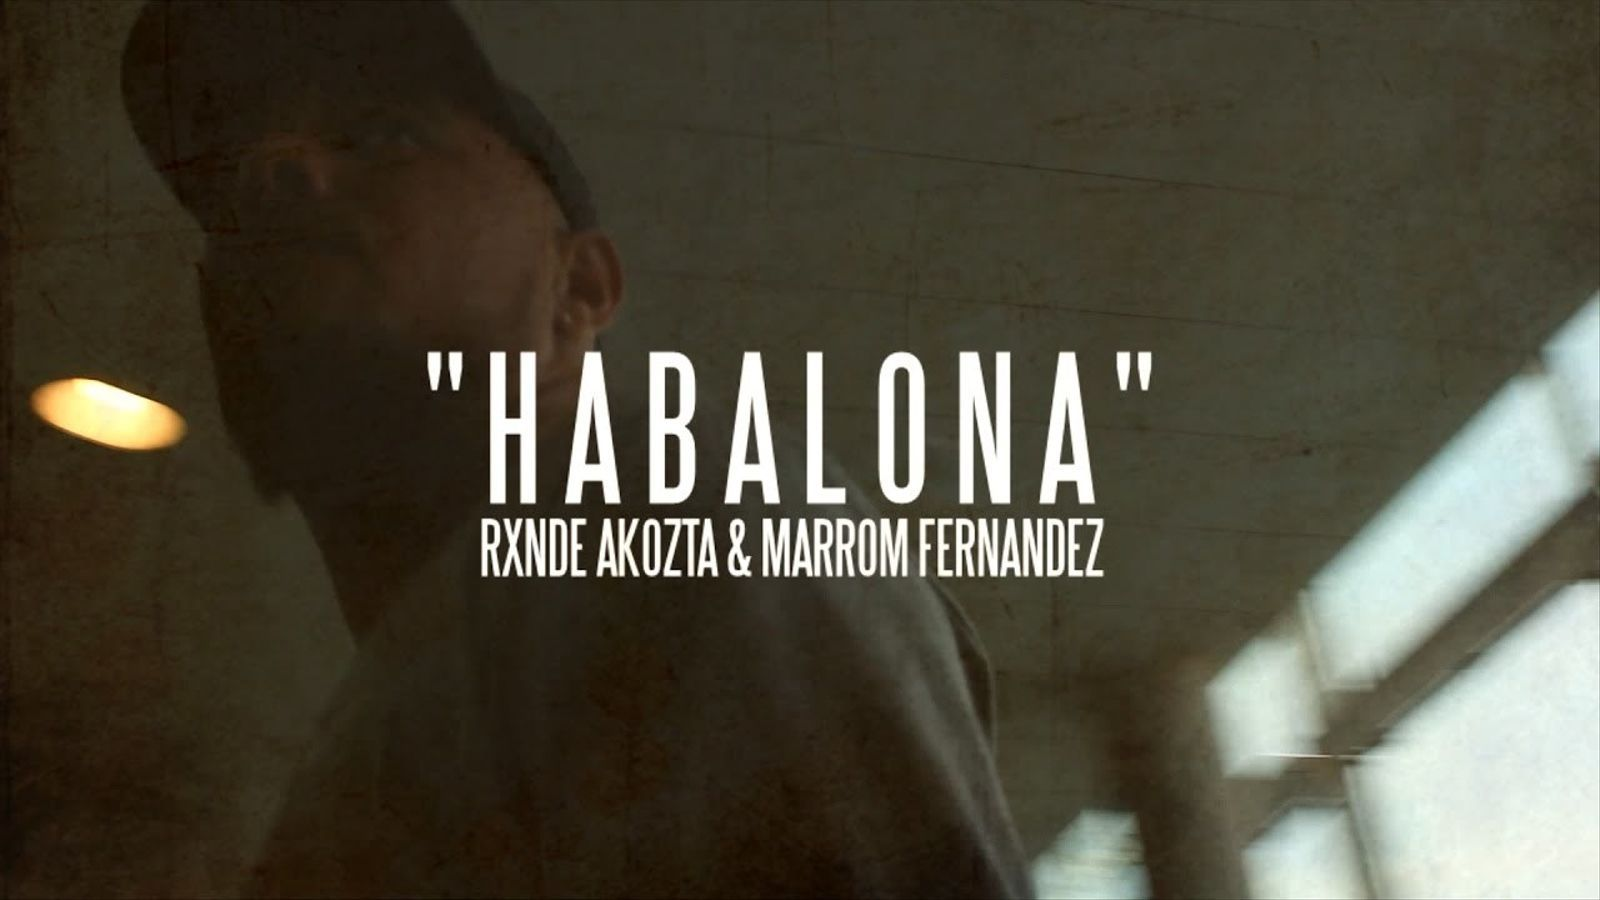 'Habalona', de Rxnde Akozta & Marrom Fernandez